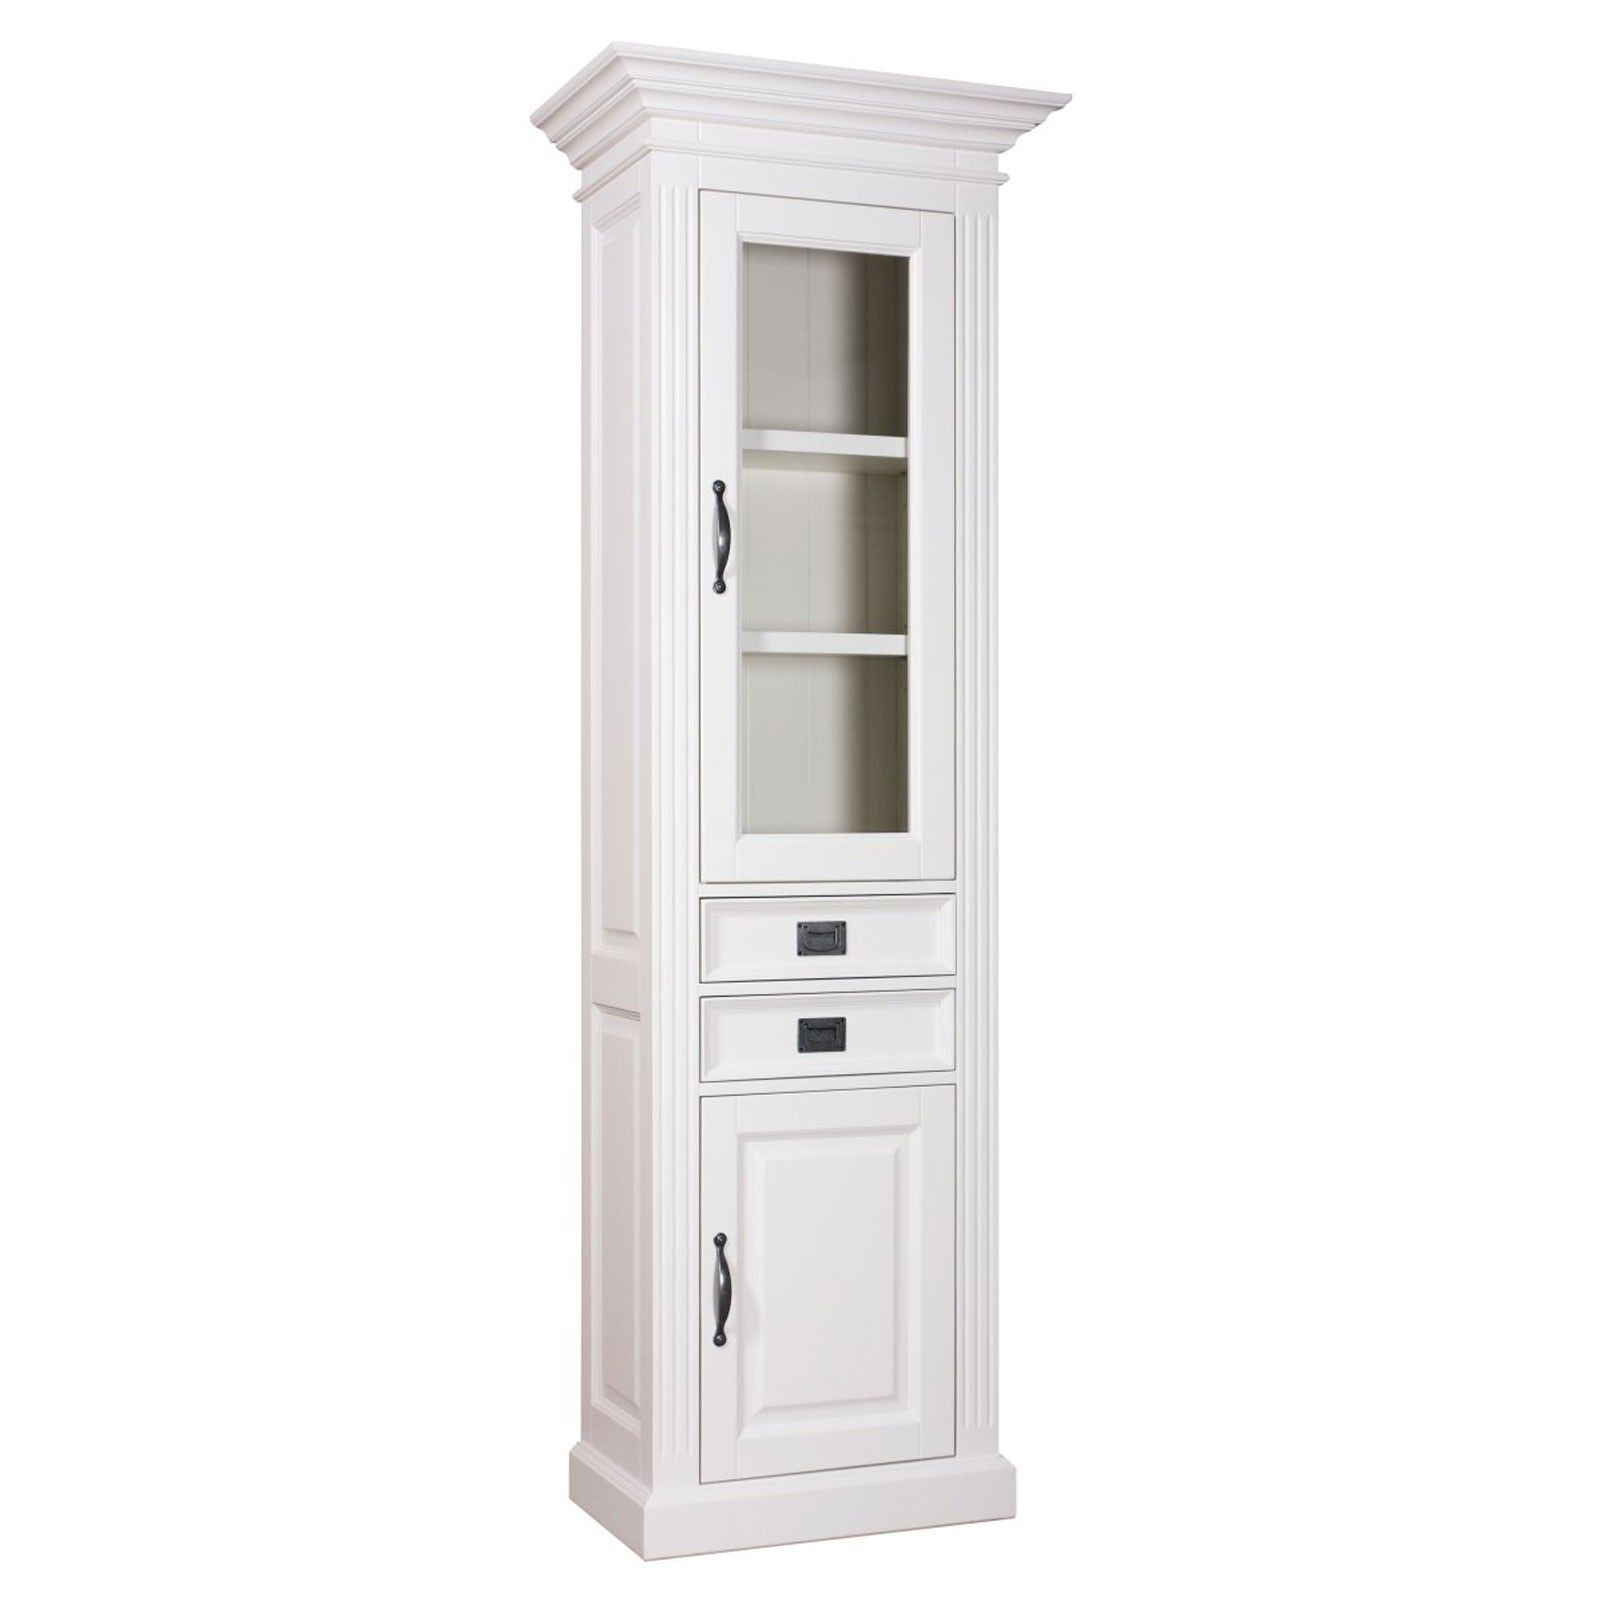 Vitrine 2x1 porte 2 tiroirs romance - achat meubles blancs